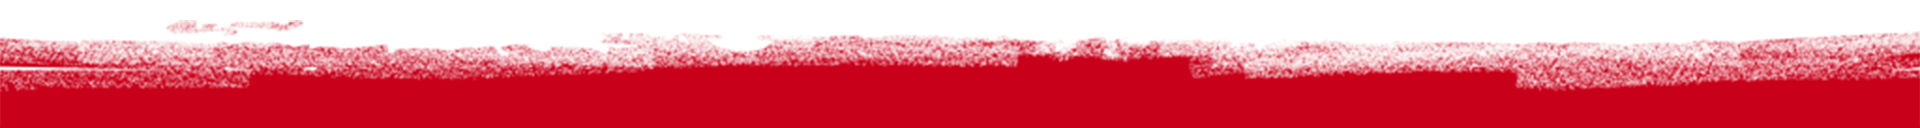 schnitzelboxx-decoration-image-bottom-red